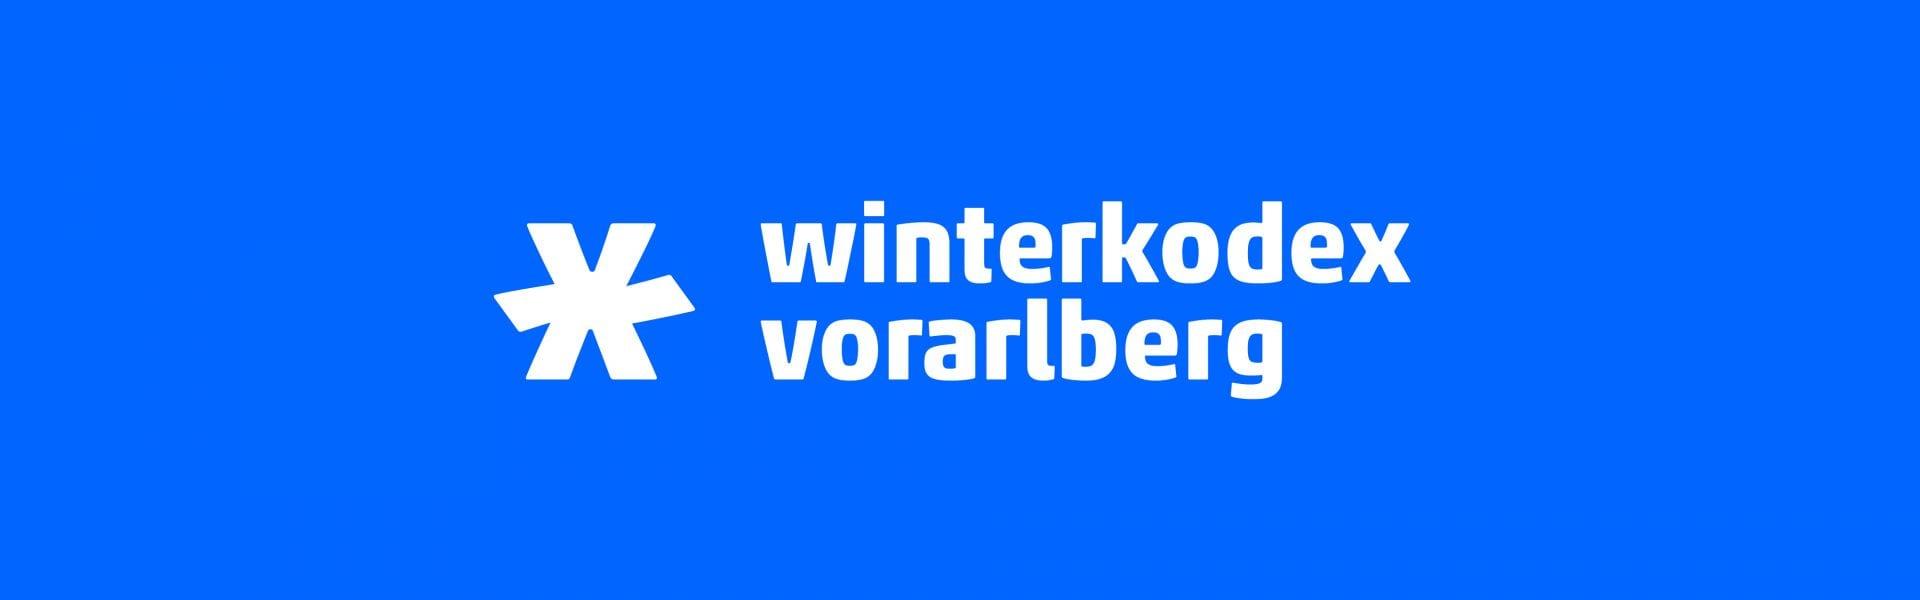 Winterkodex Vorarlberg